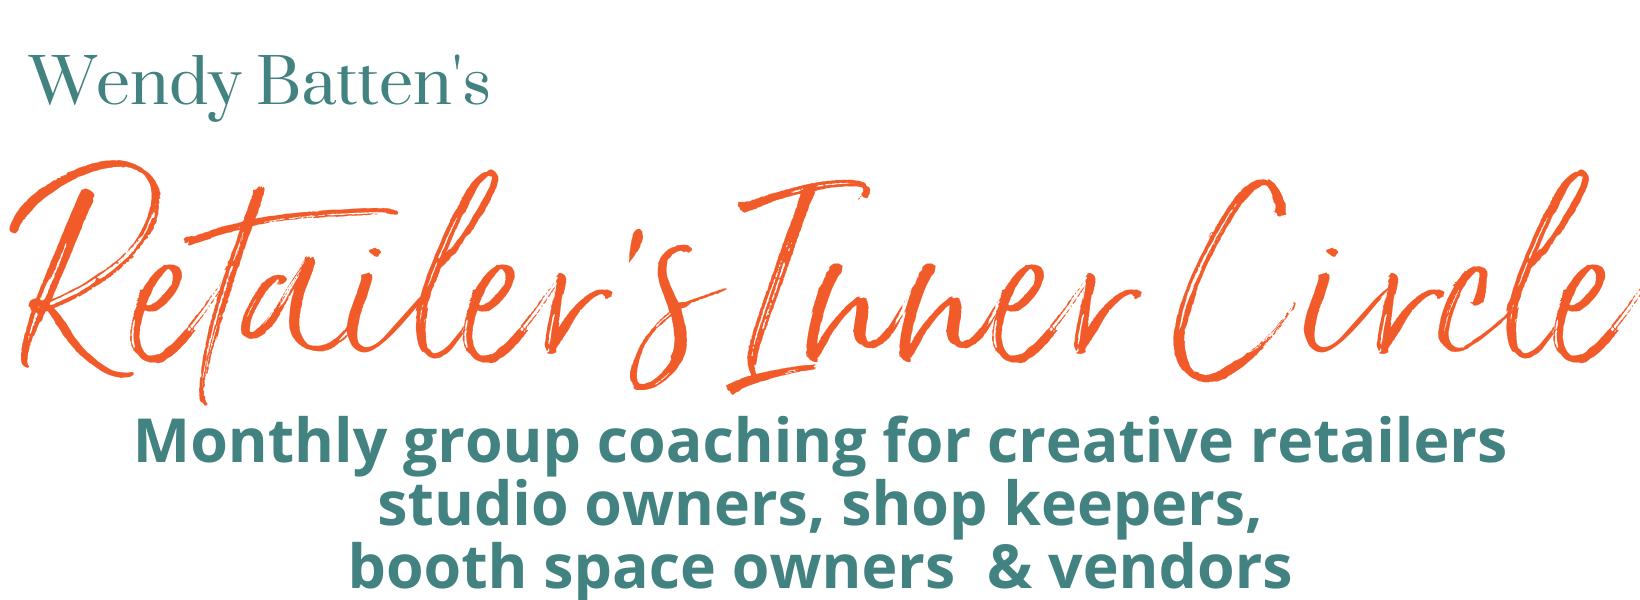 Wendy Batten's Retail Coaching Group